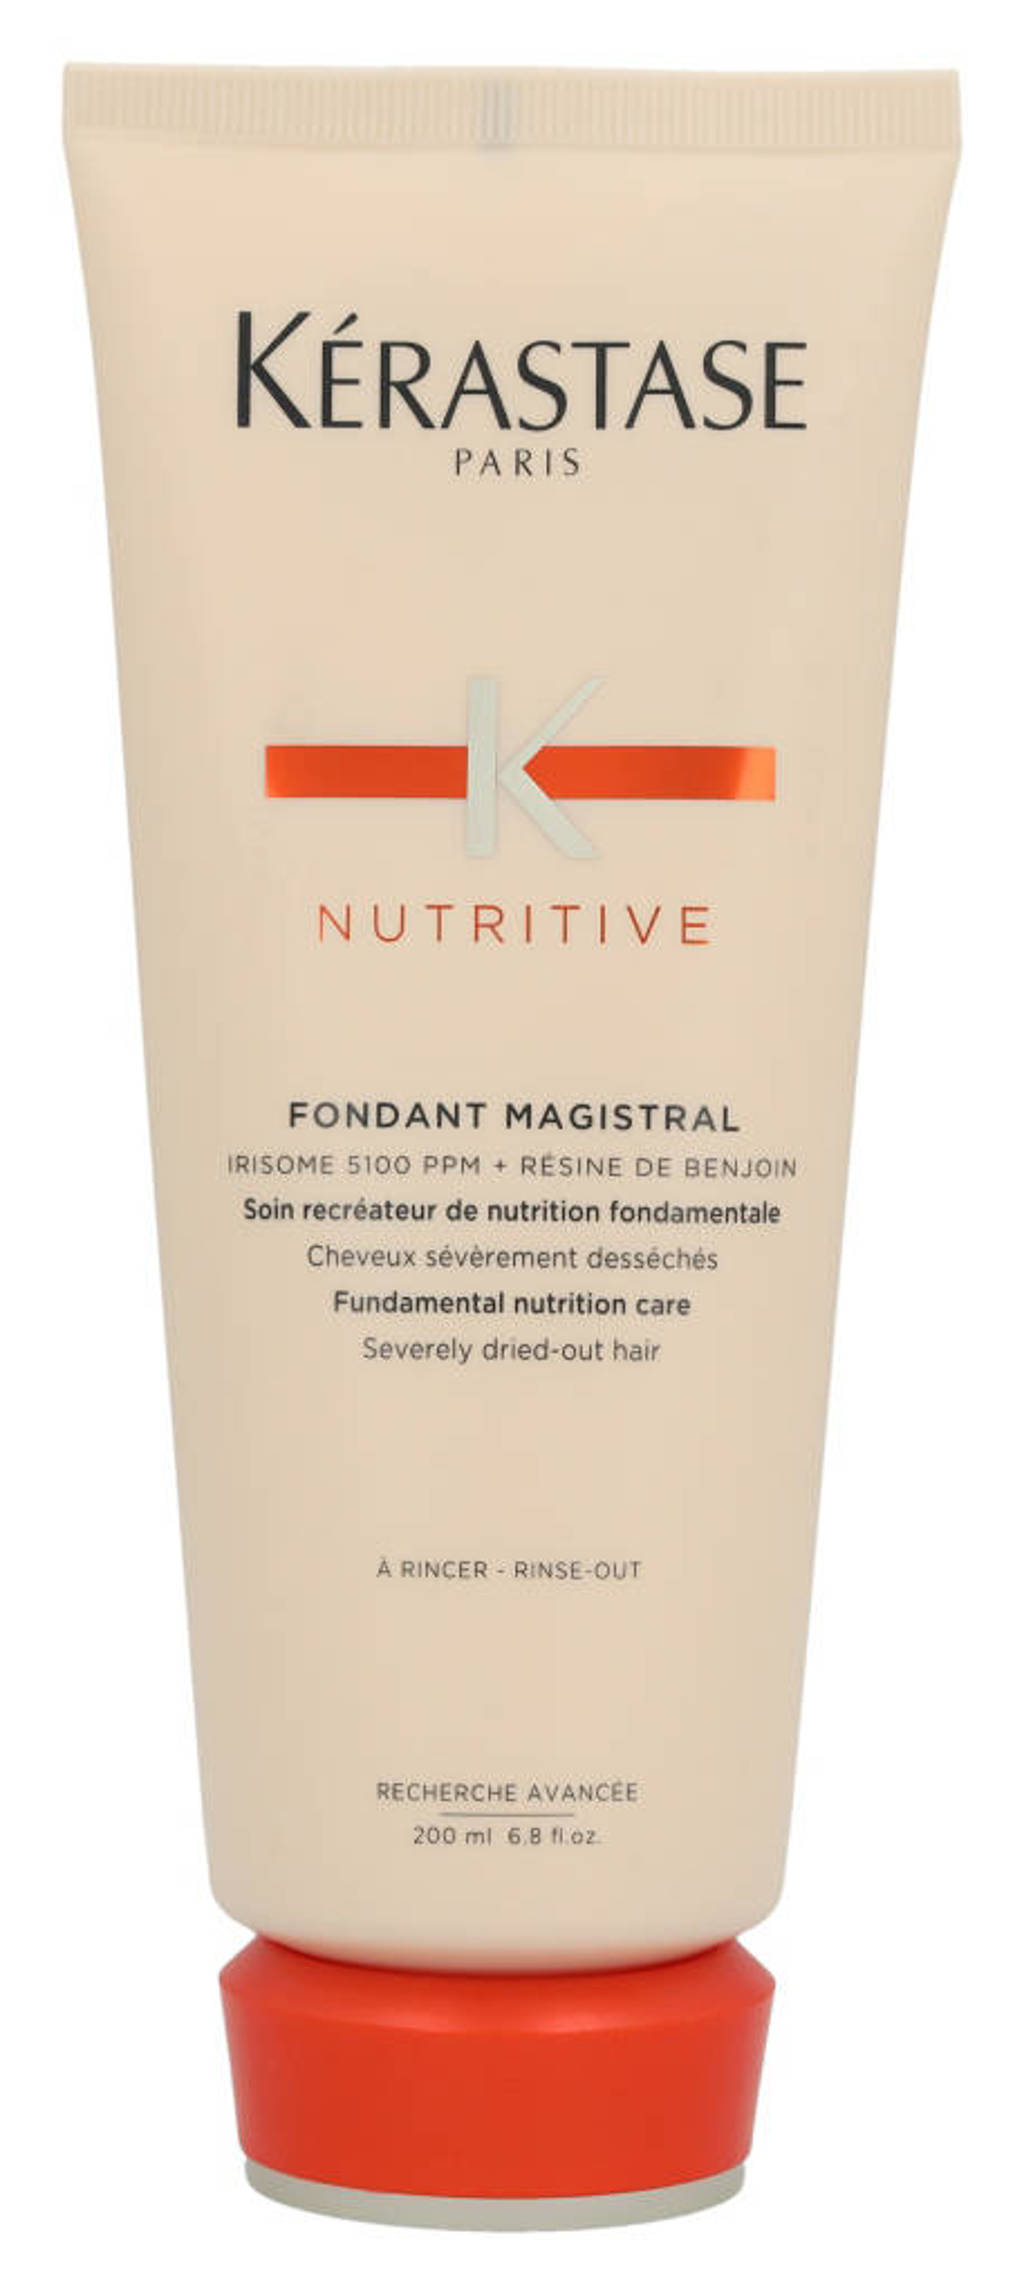 Kerastase Nutritive Fondant Magistral Hair conditioner - 200 ml